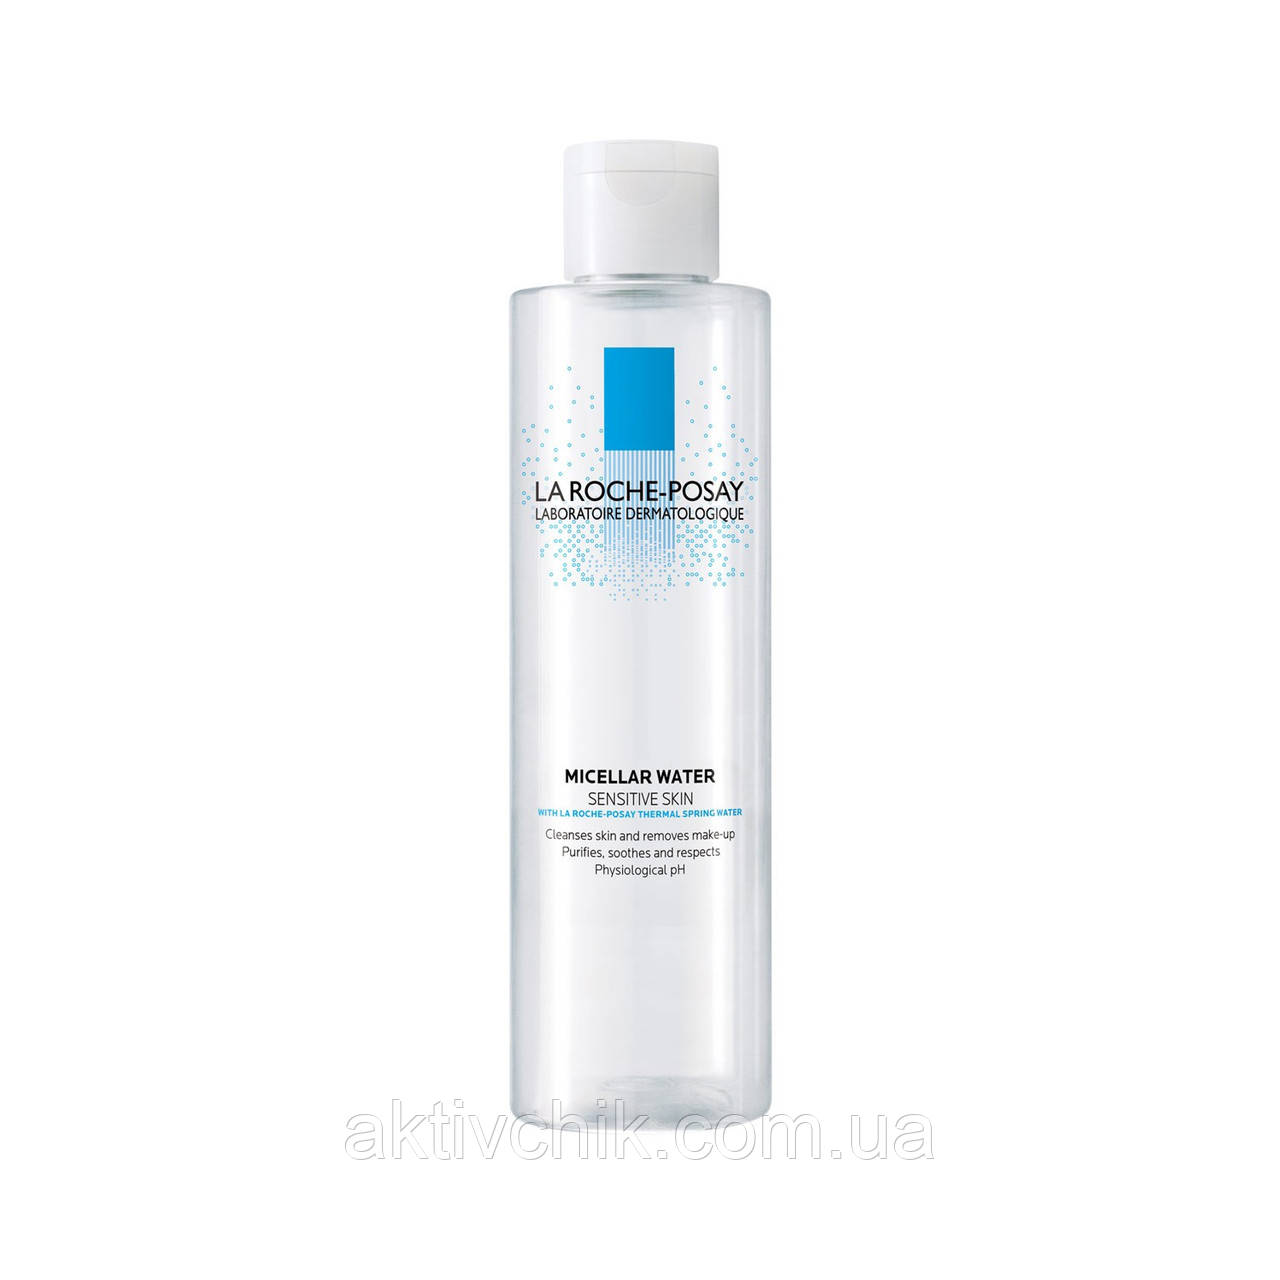 Міцелярна вода для чутливої шкіри обличчя La Roche-Posay Physiological Micellar Water Sensitive Skin 50мл